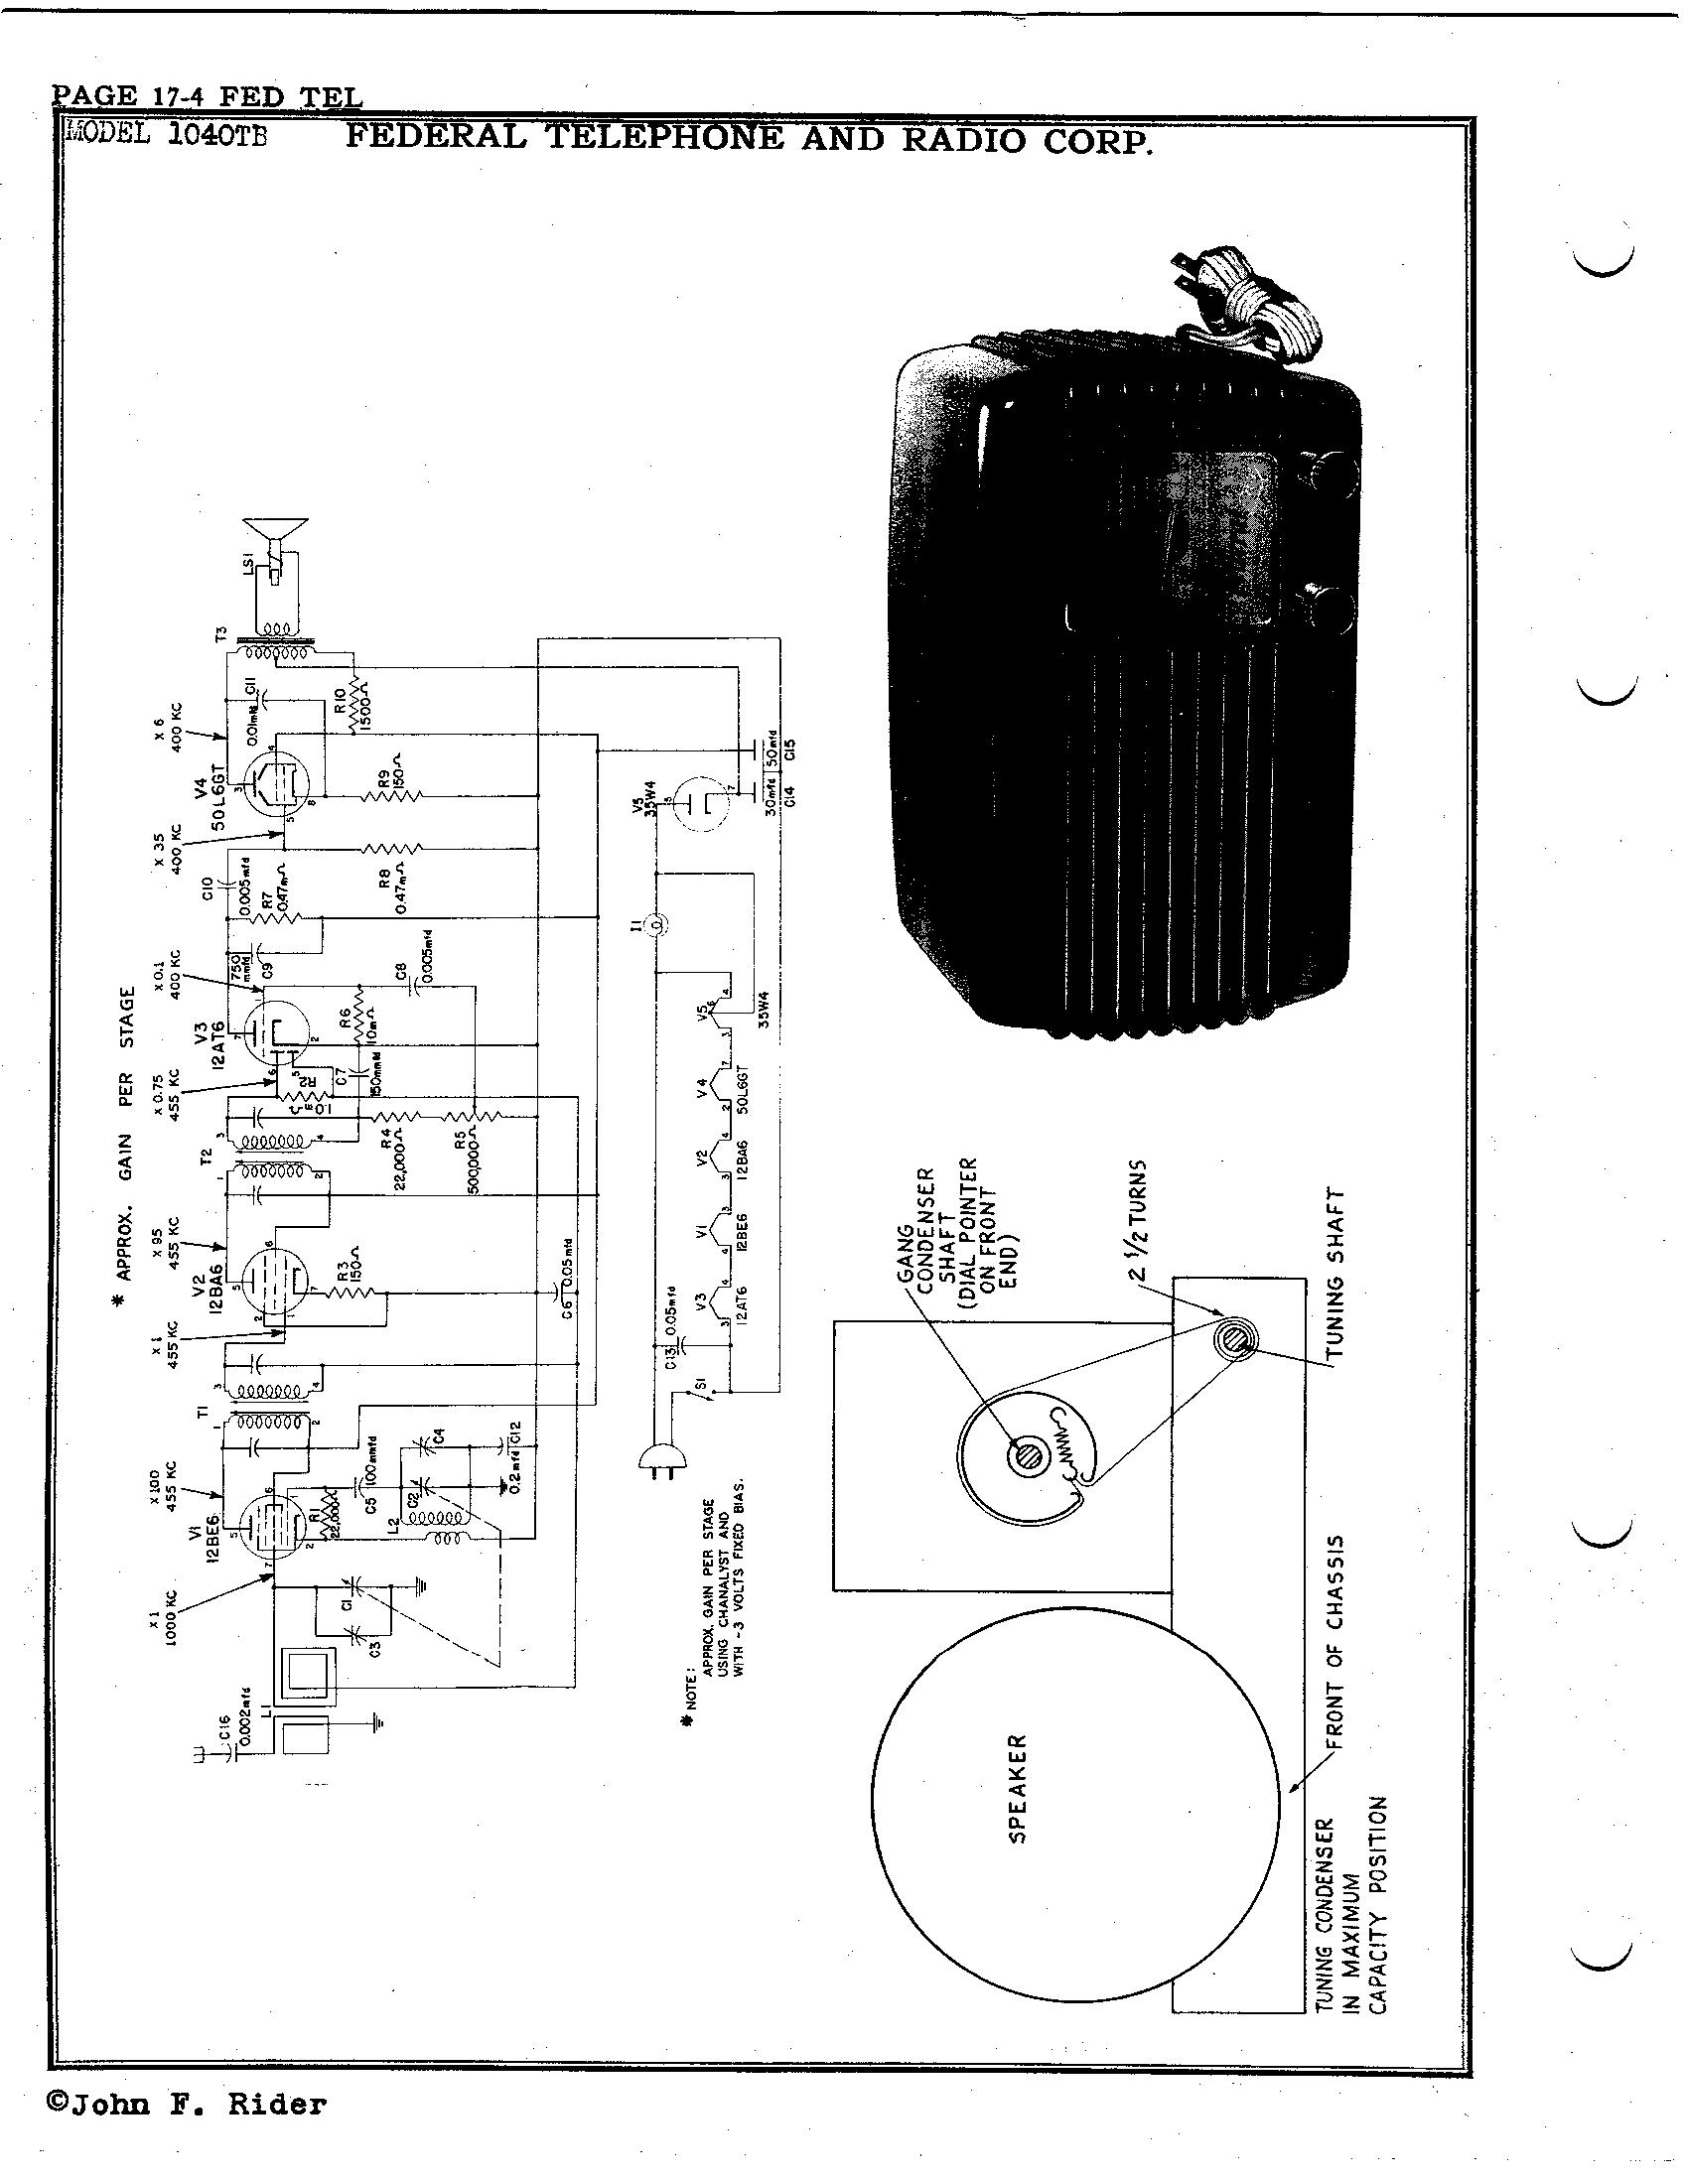 Federal Telephone And Radio Corp Tb